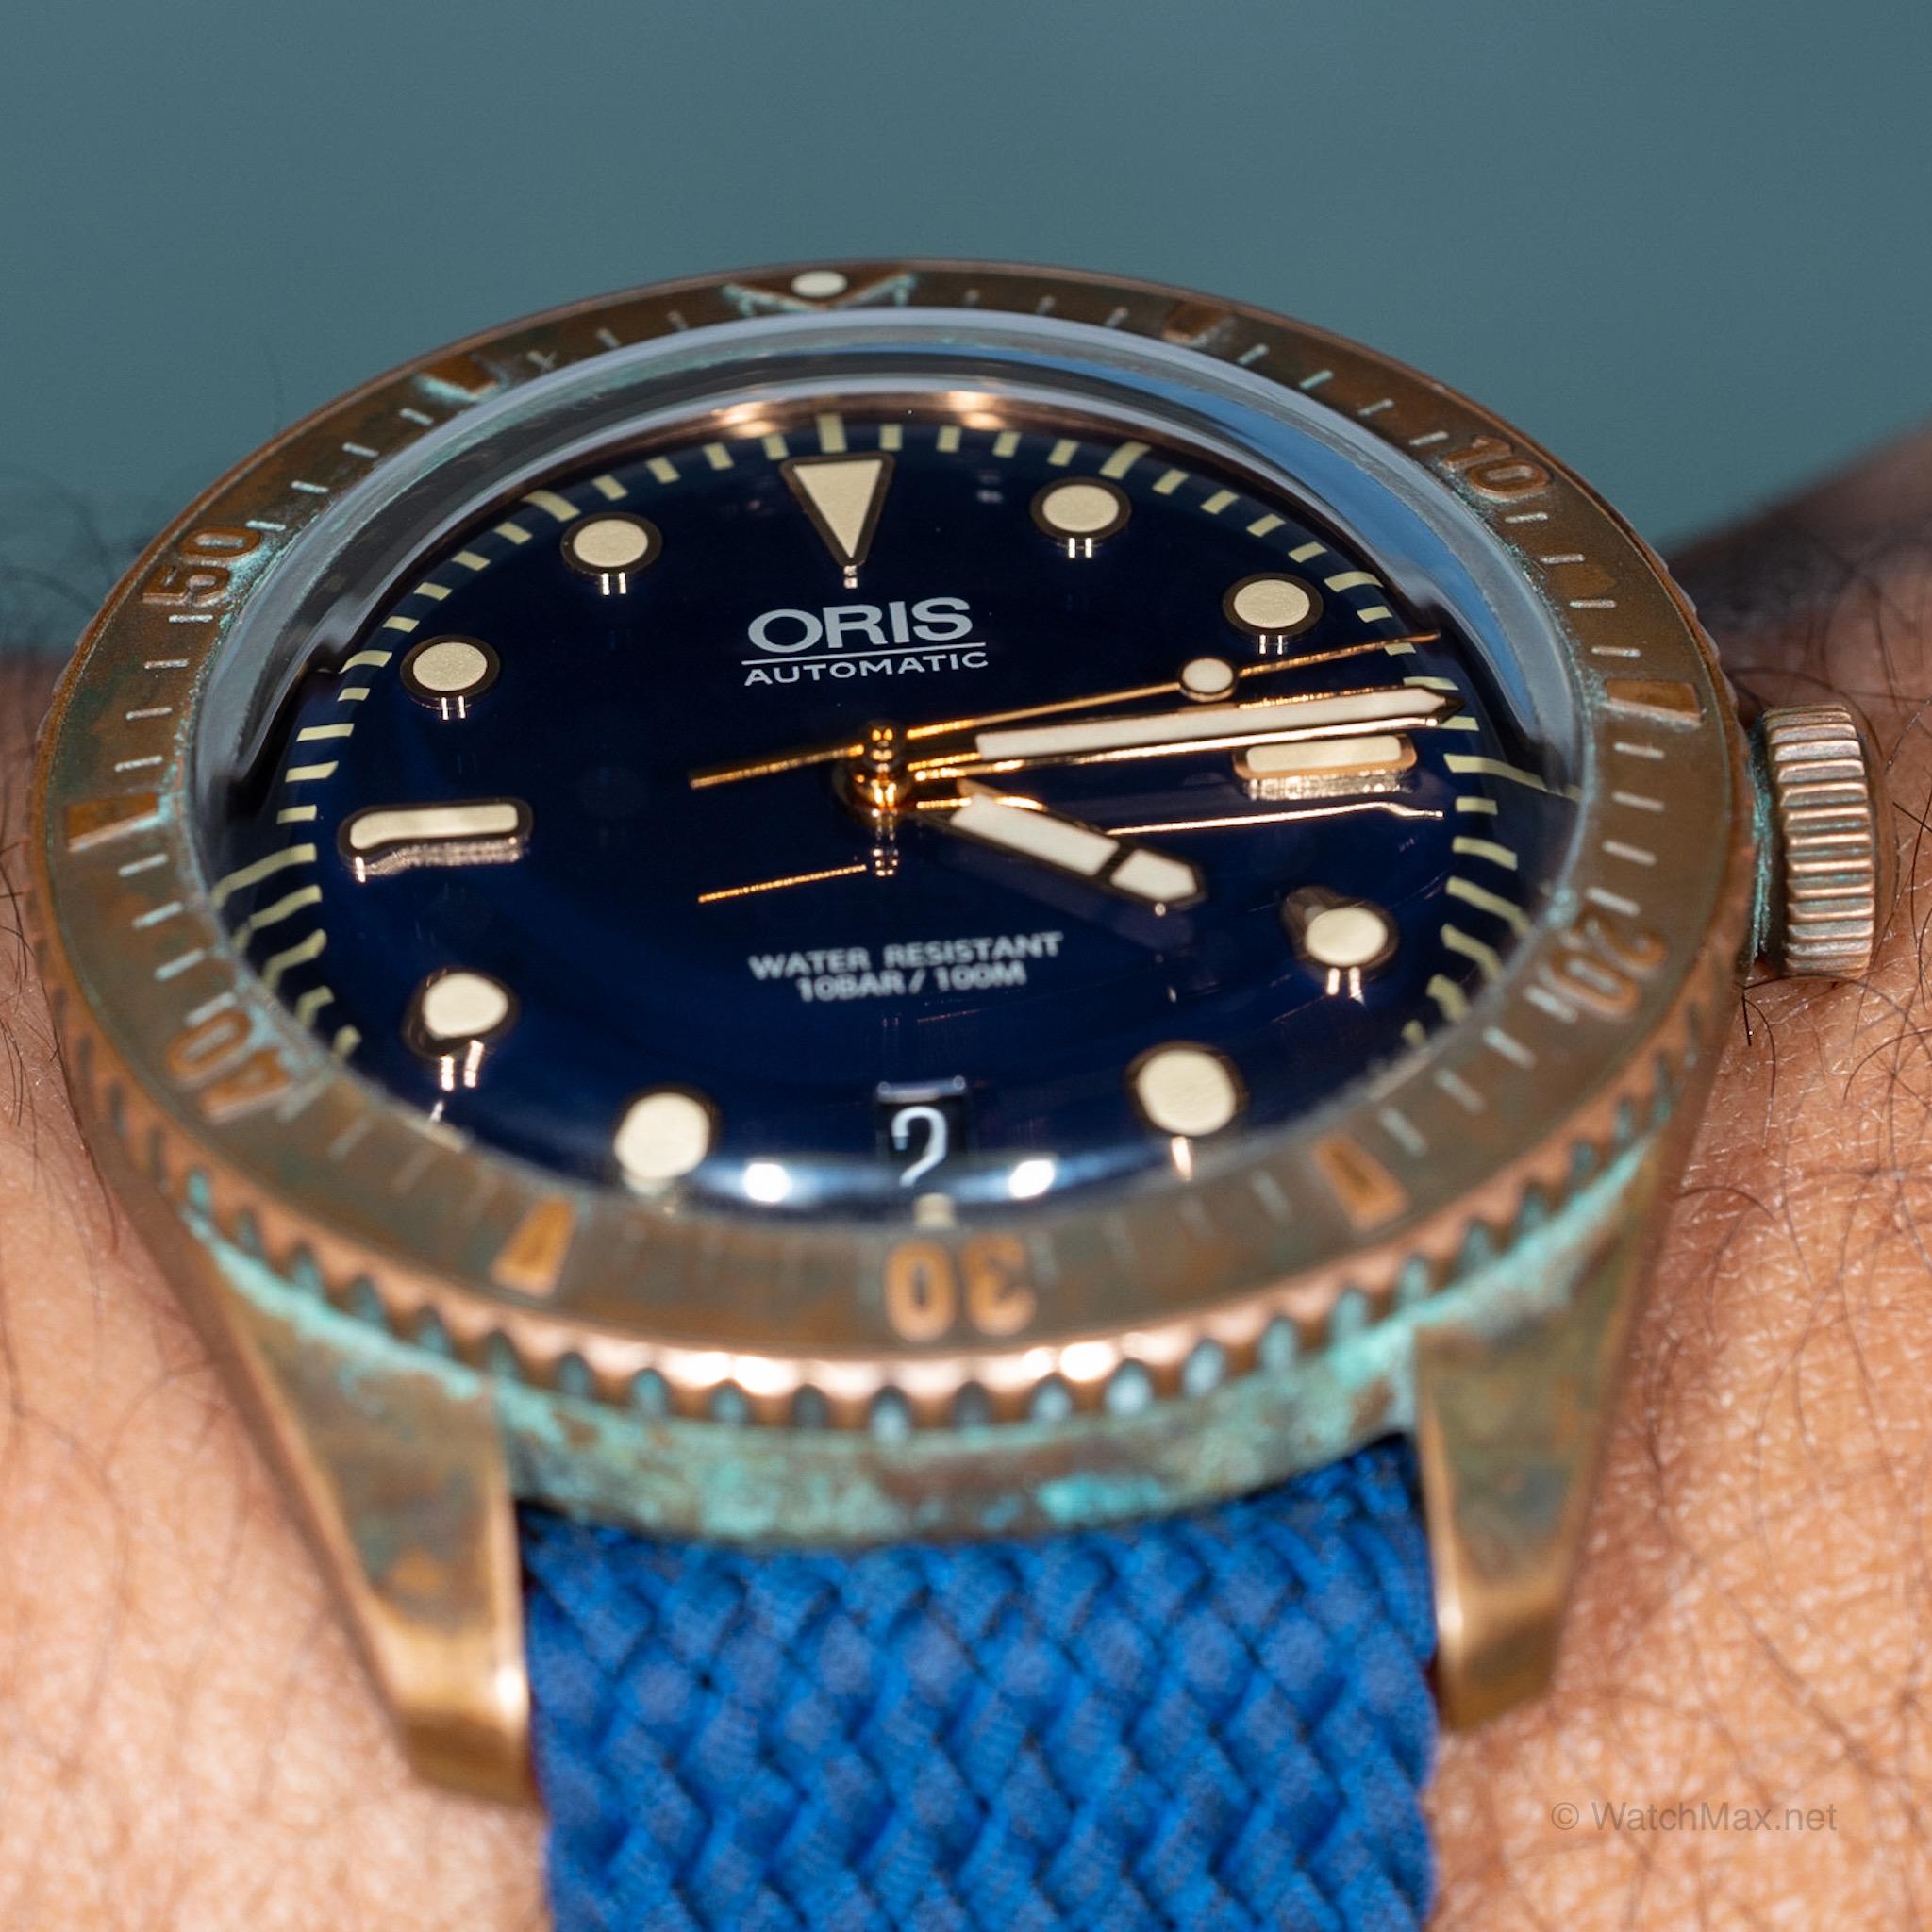 oris-diver-sixtyfive-carl-brashear-limited-edition-58.JPG